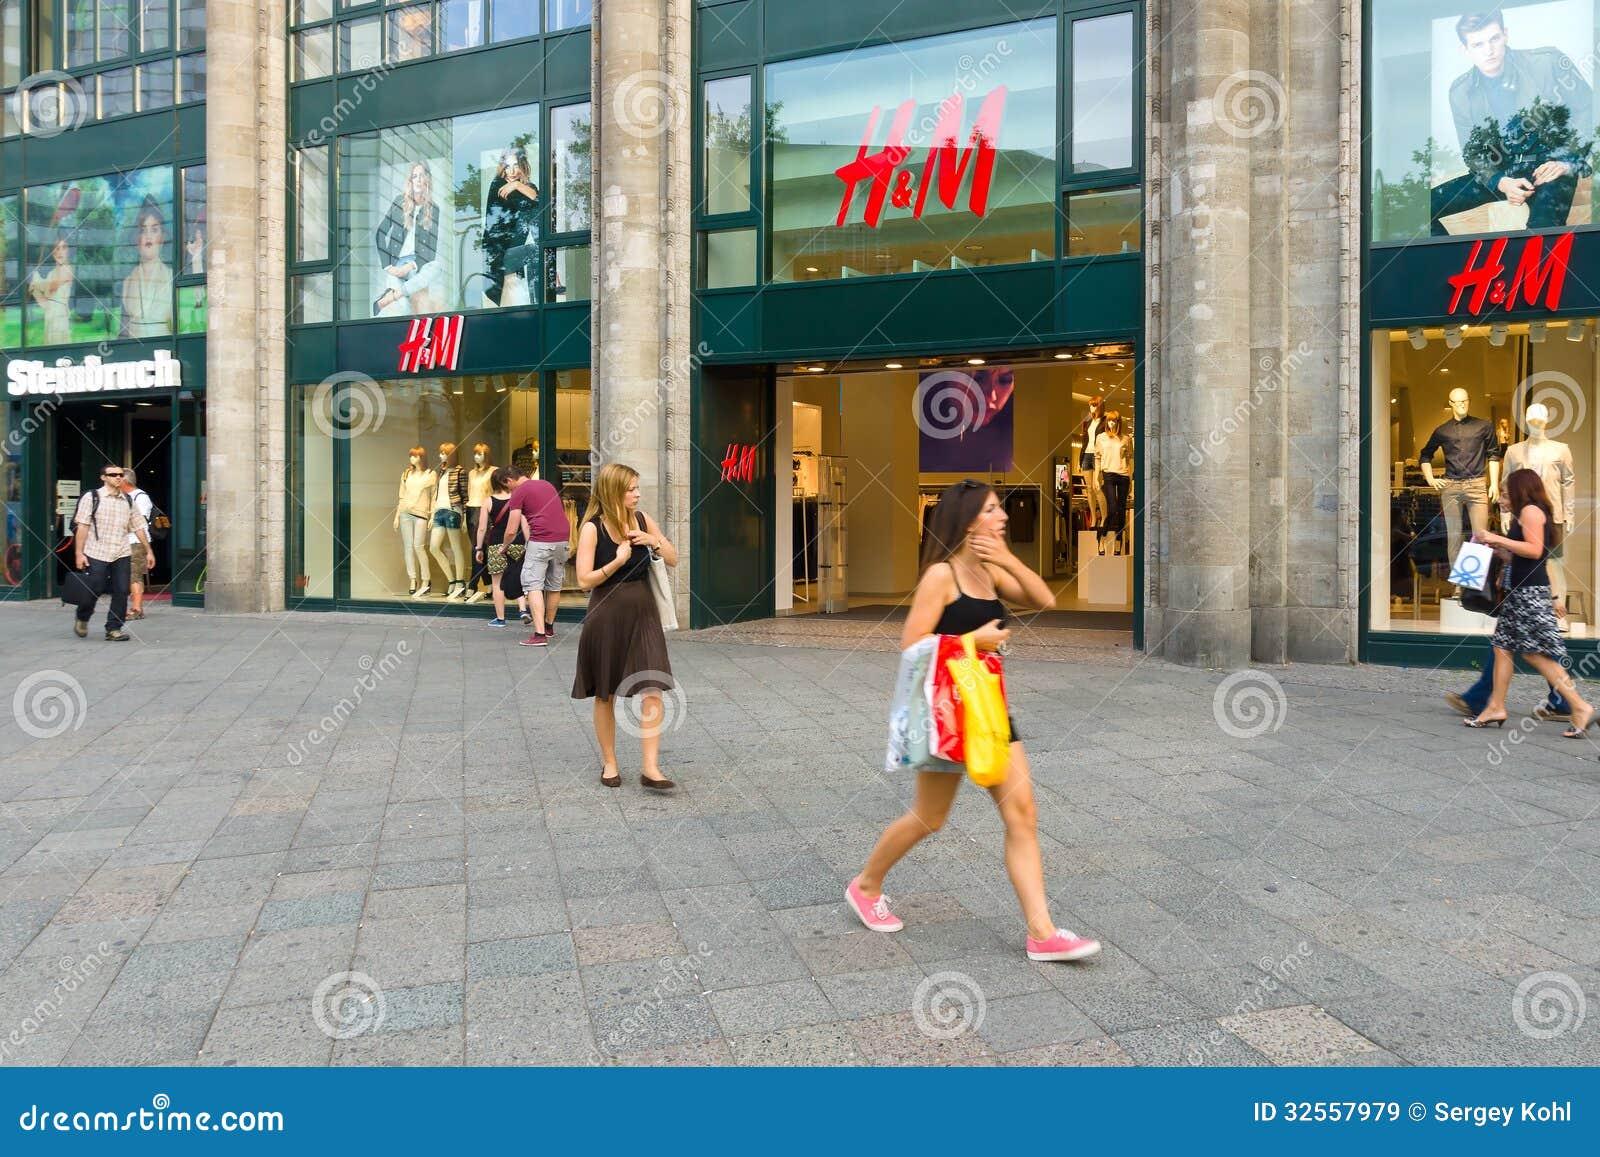 Chinese shopping at Swedish clothing retailer H&M store in Tianjin, China. 07-May